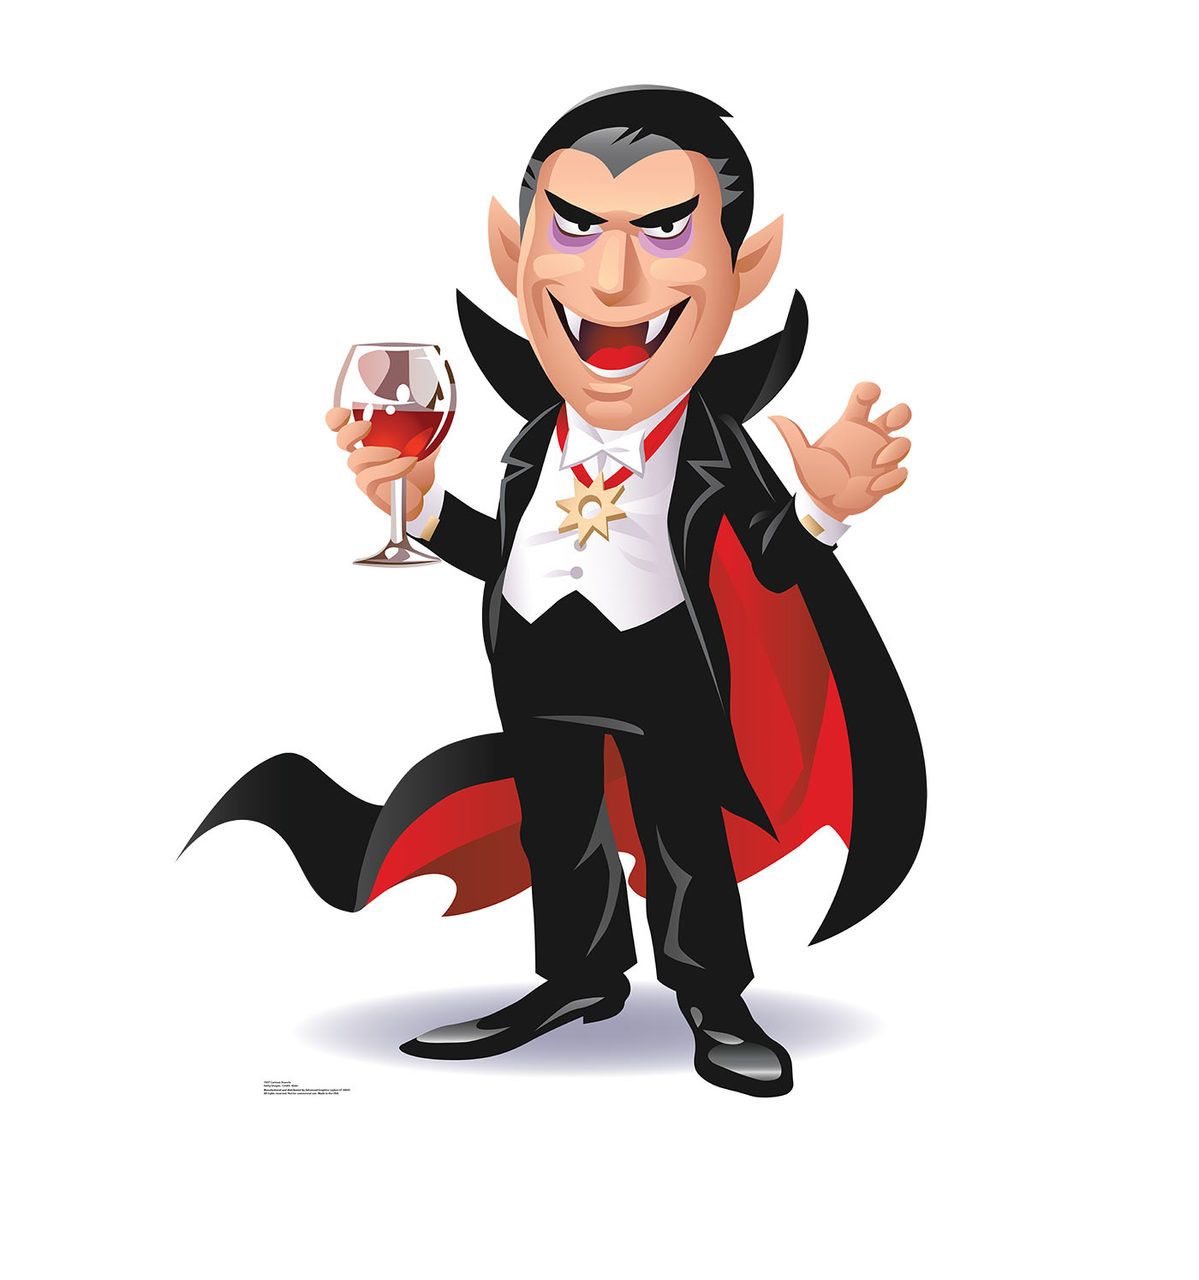 Life-size Cartoon Dracula Cardboard Standup 2